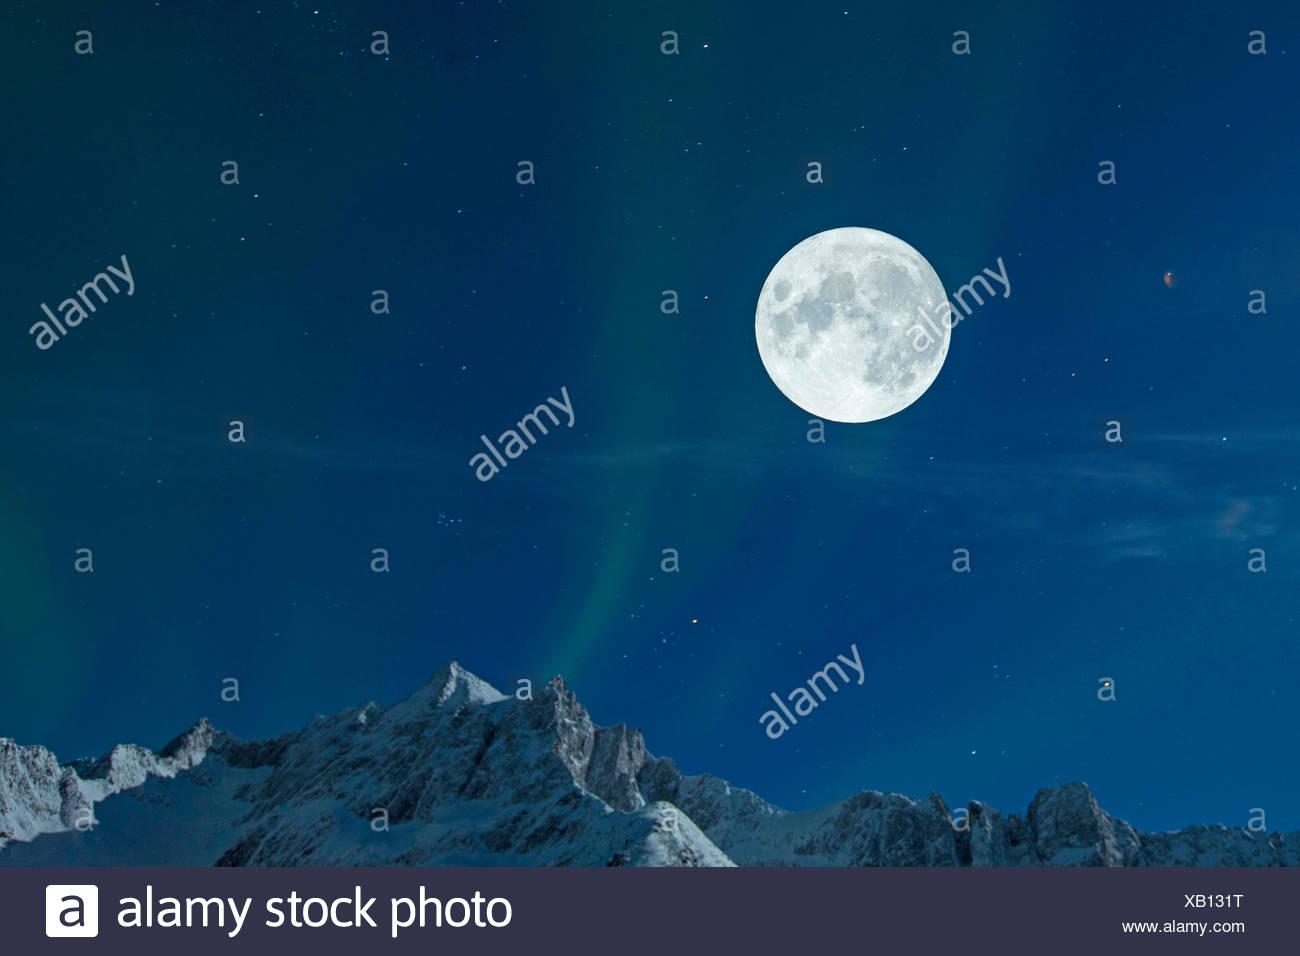 Vollmond mit Sternenhimmel und Nordlicht ueber Berggipfeln, Norwegen, Troms, Senja   full moon with starry sky and polar light o - Stock Image